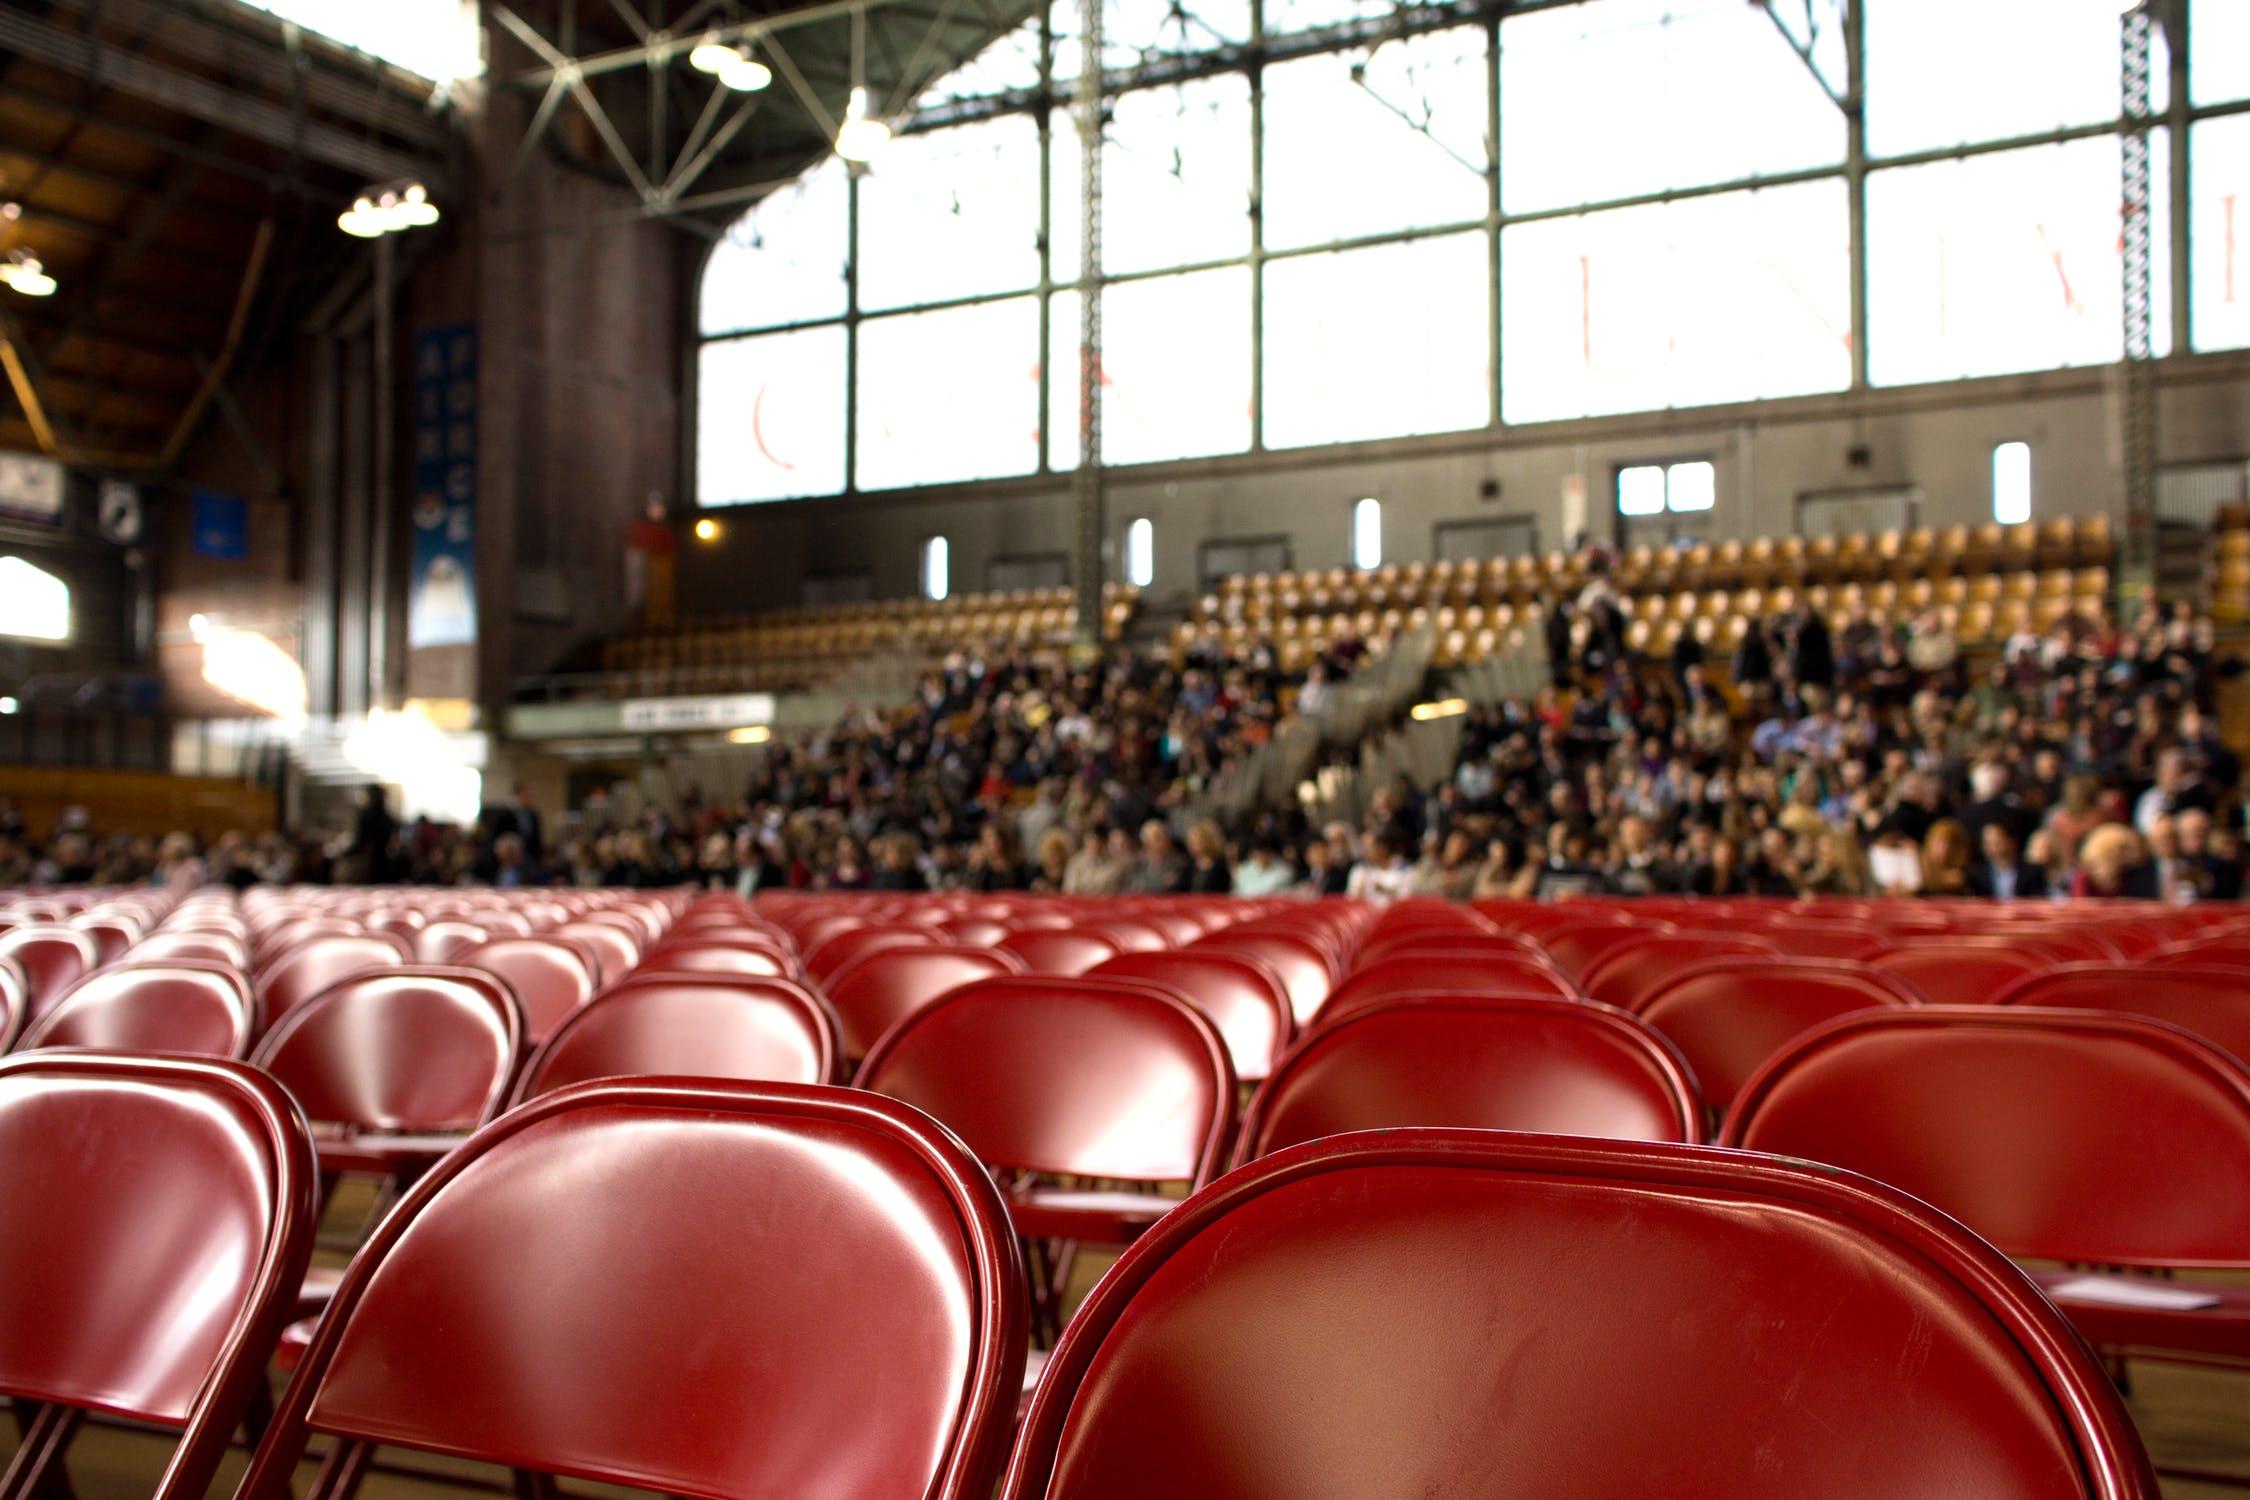 people-show-chairs-gym.jpg